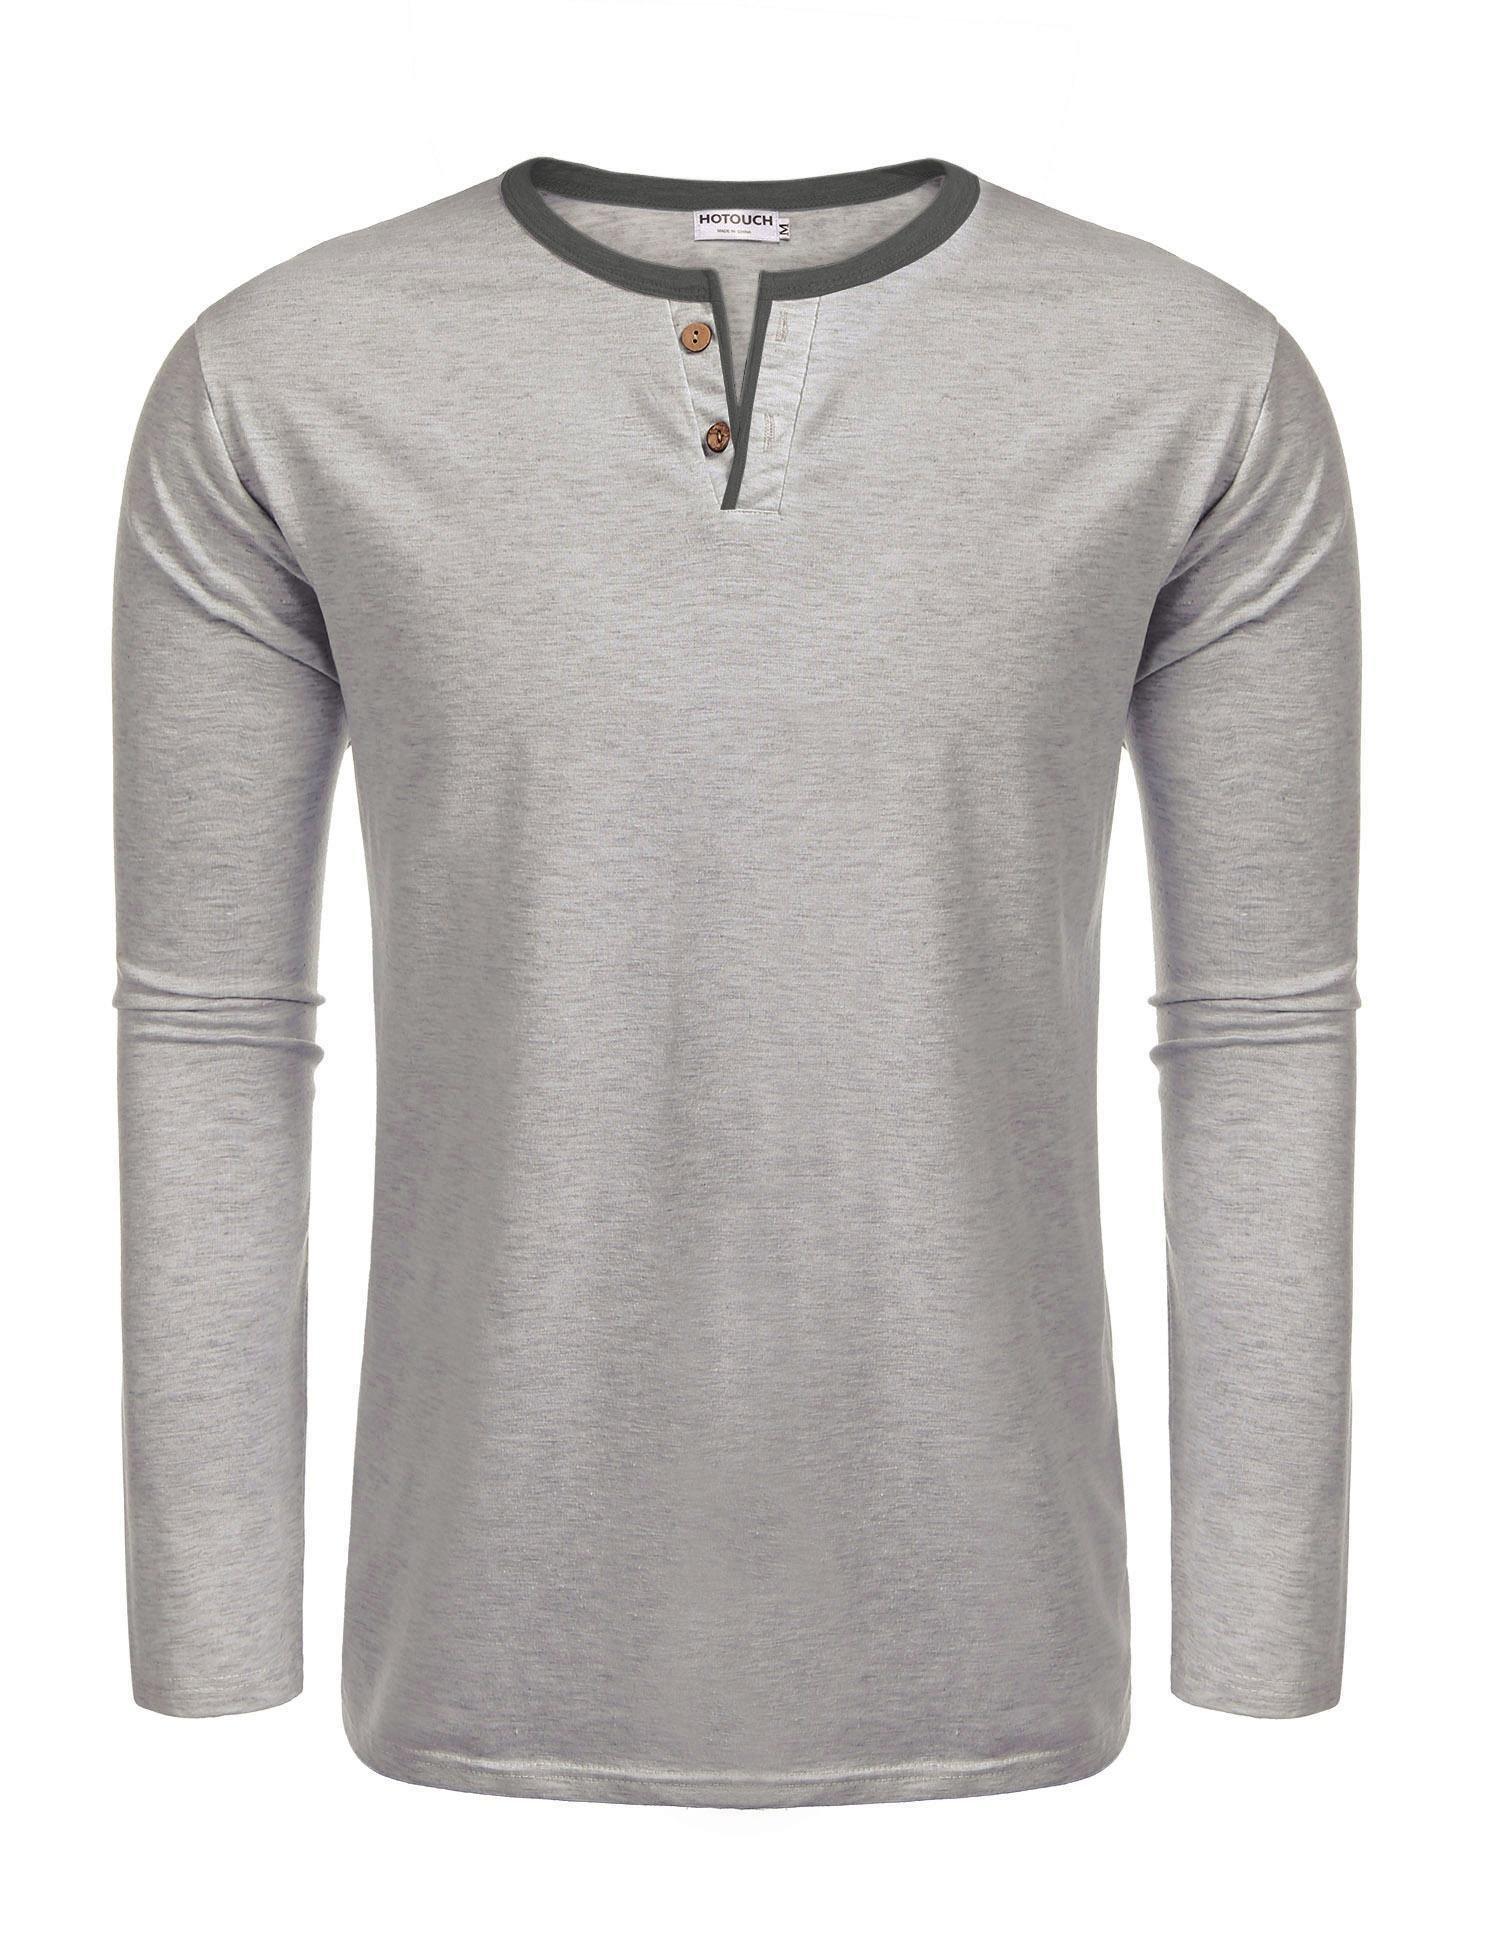 Donkap Men's Long Sleeve Heavyweight Henley Grey L